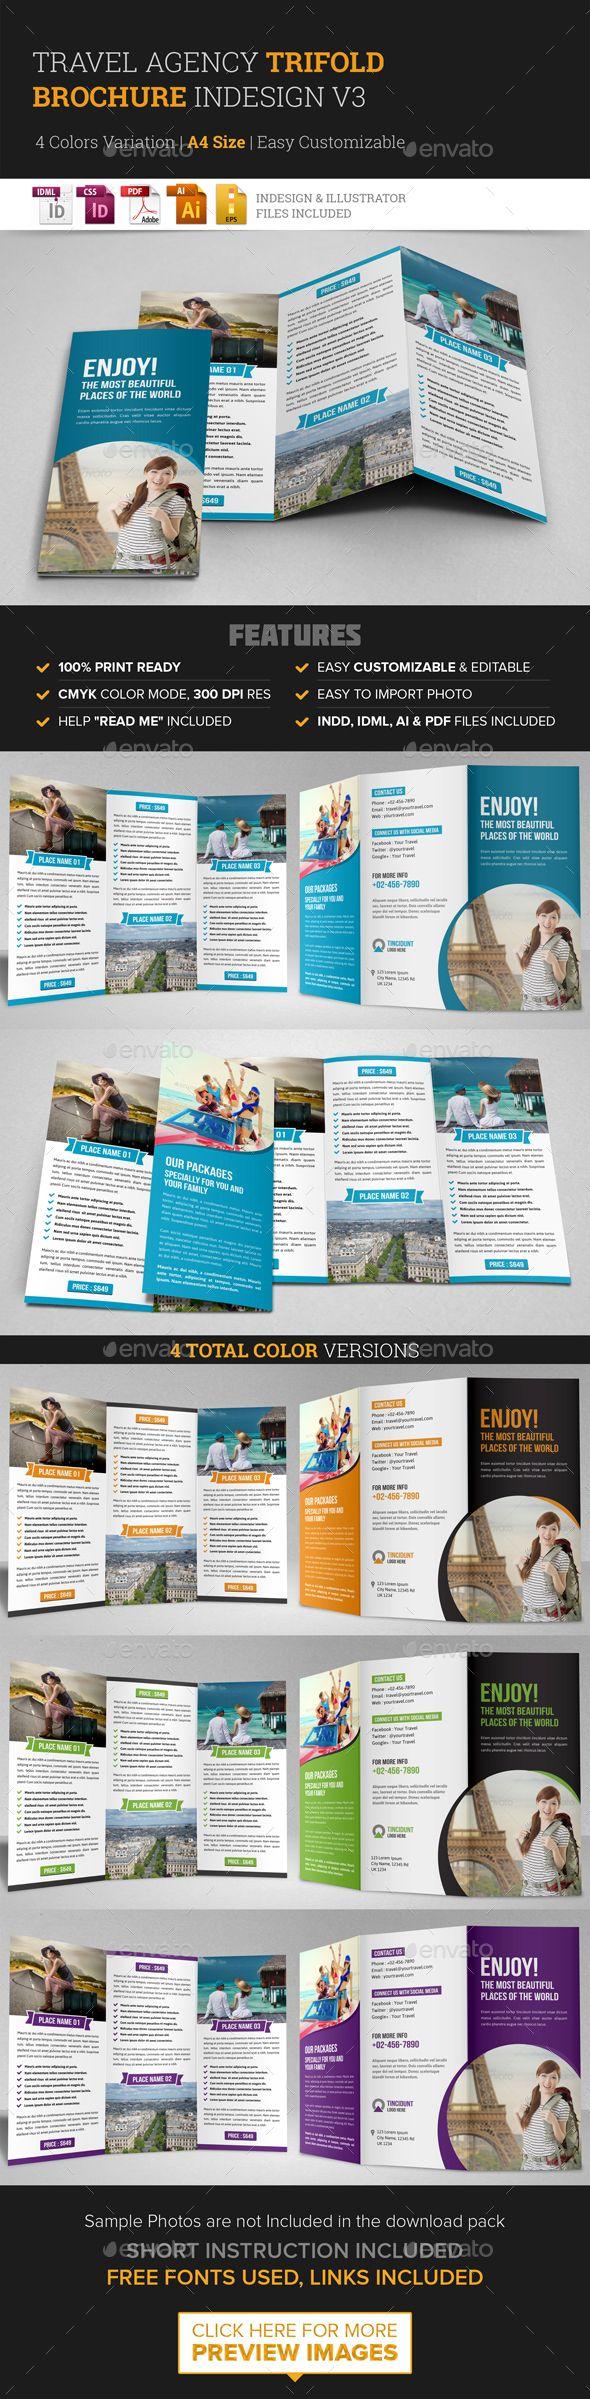 Travel Trifold Brochure InDesign Template v3